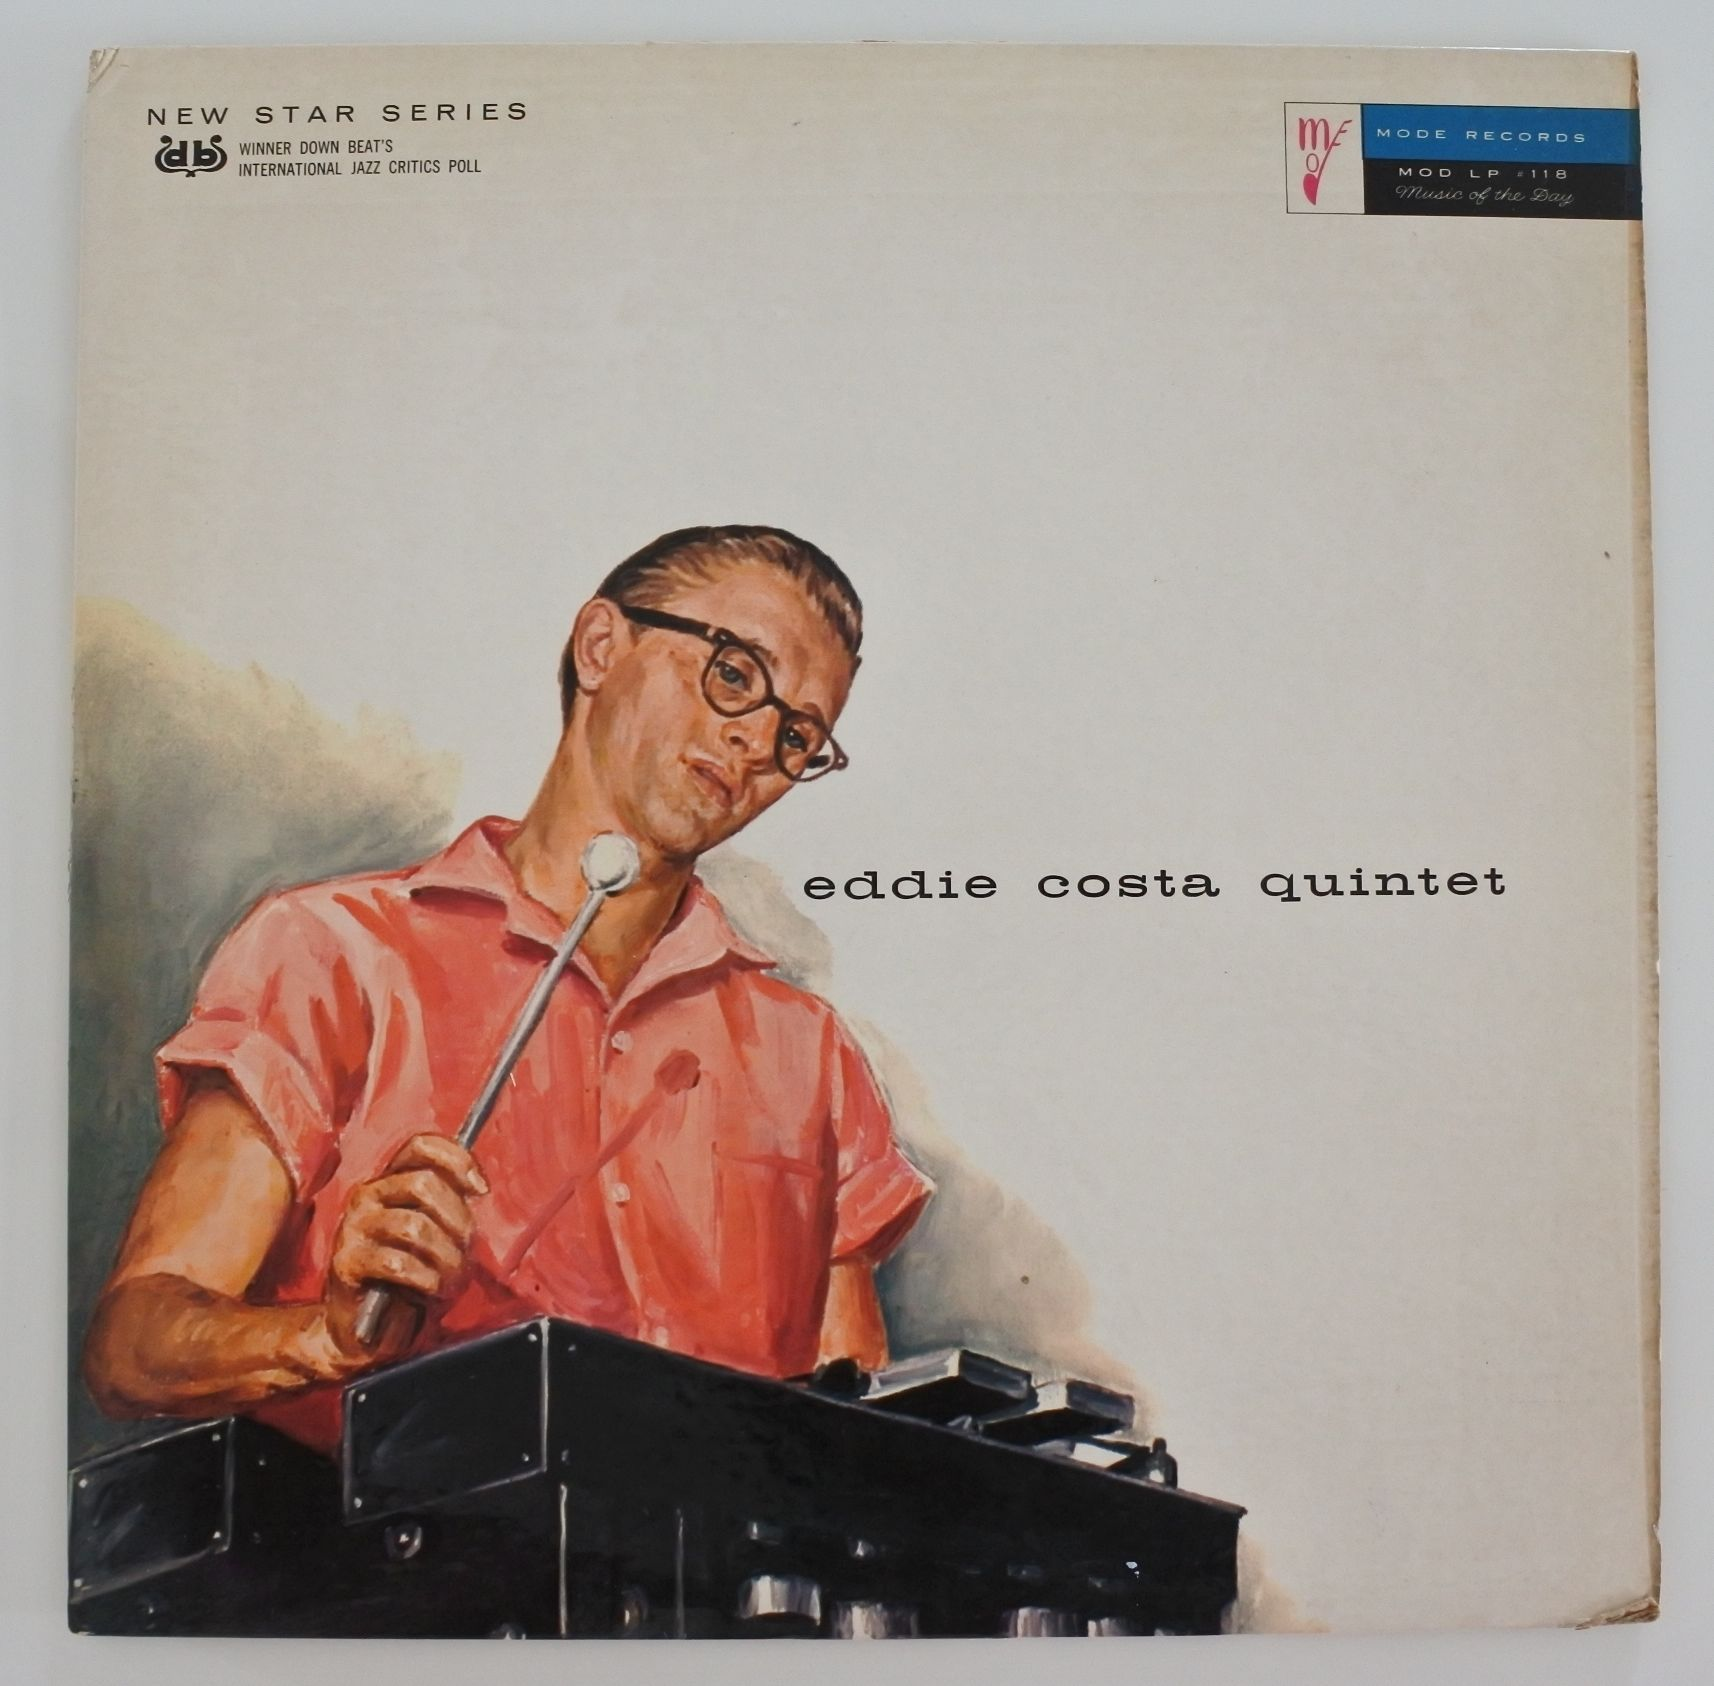 Eddie Costa Quintet  ?- Eddie Costa Quintet ( Mode Records MOD LP 118 ) mono